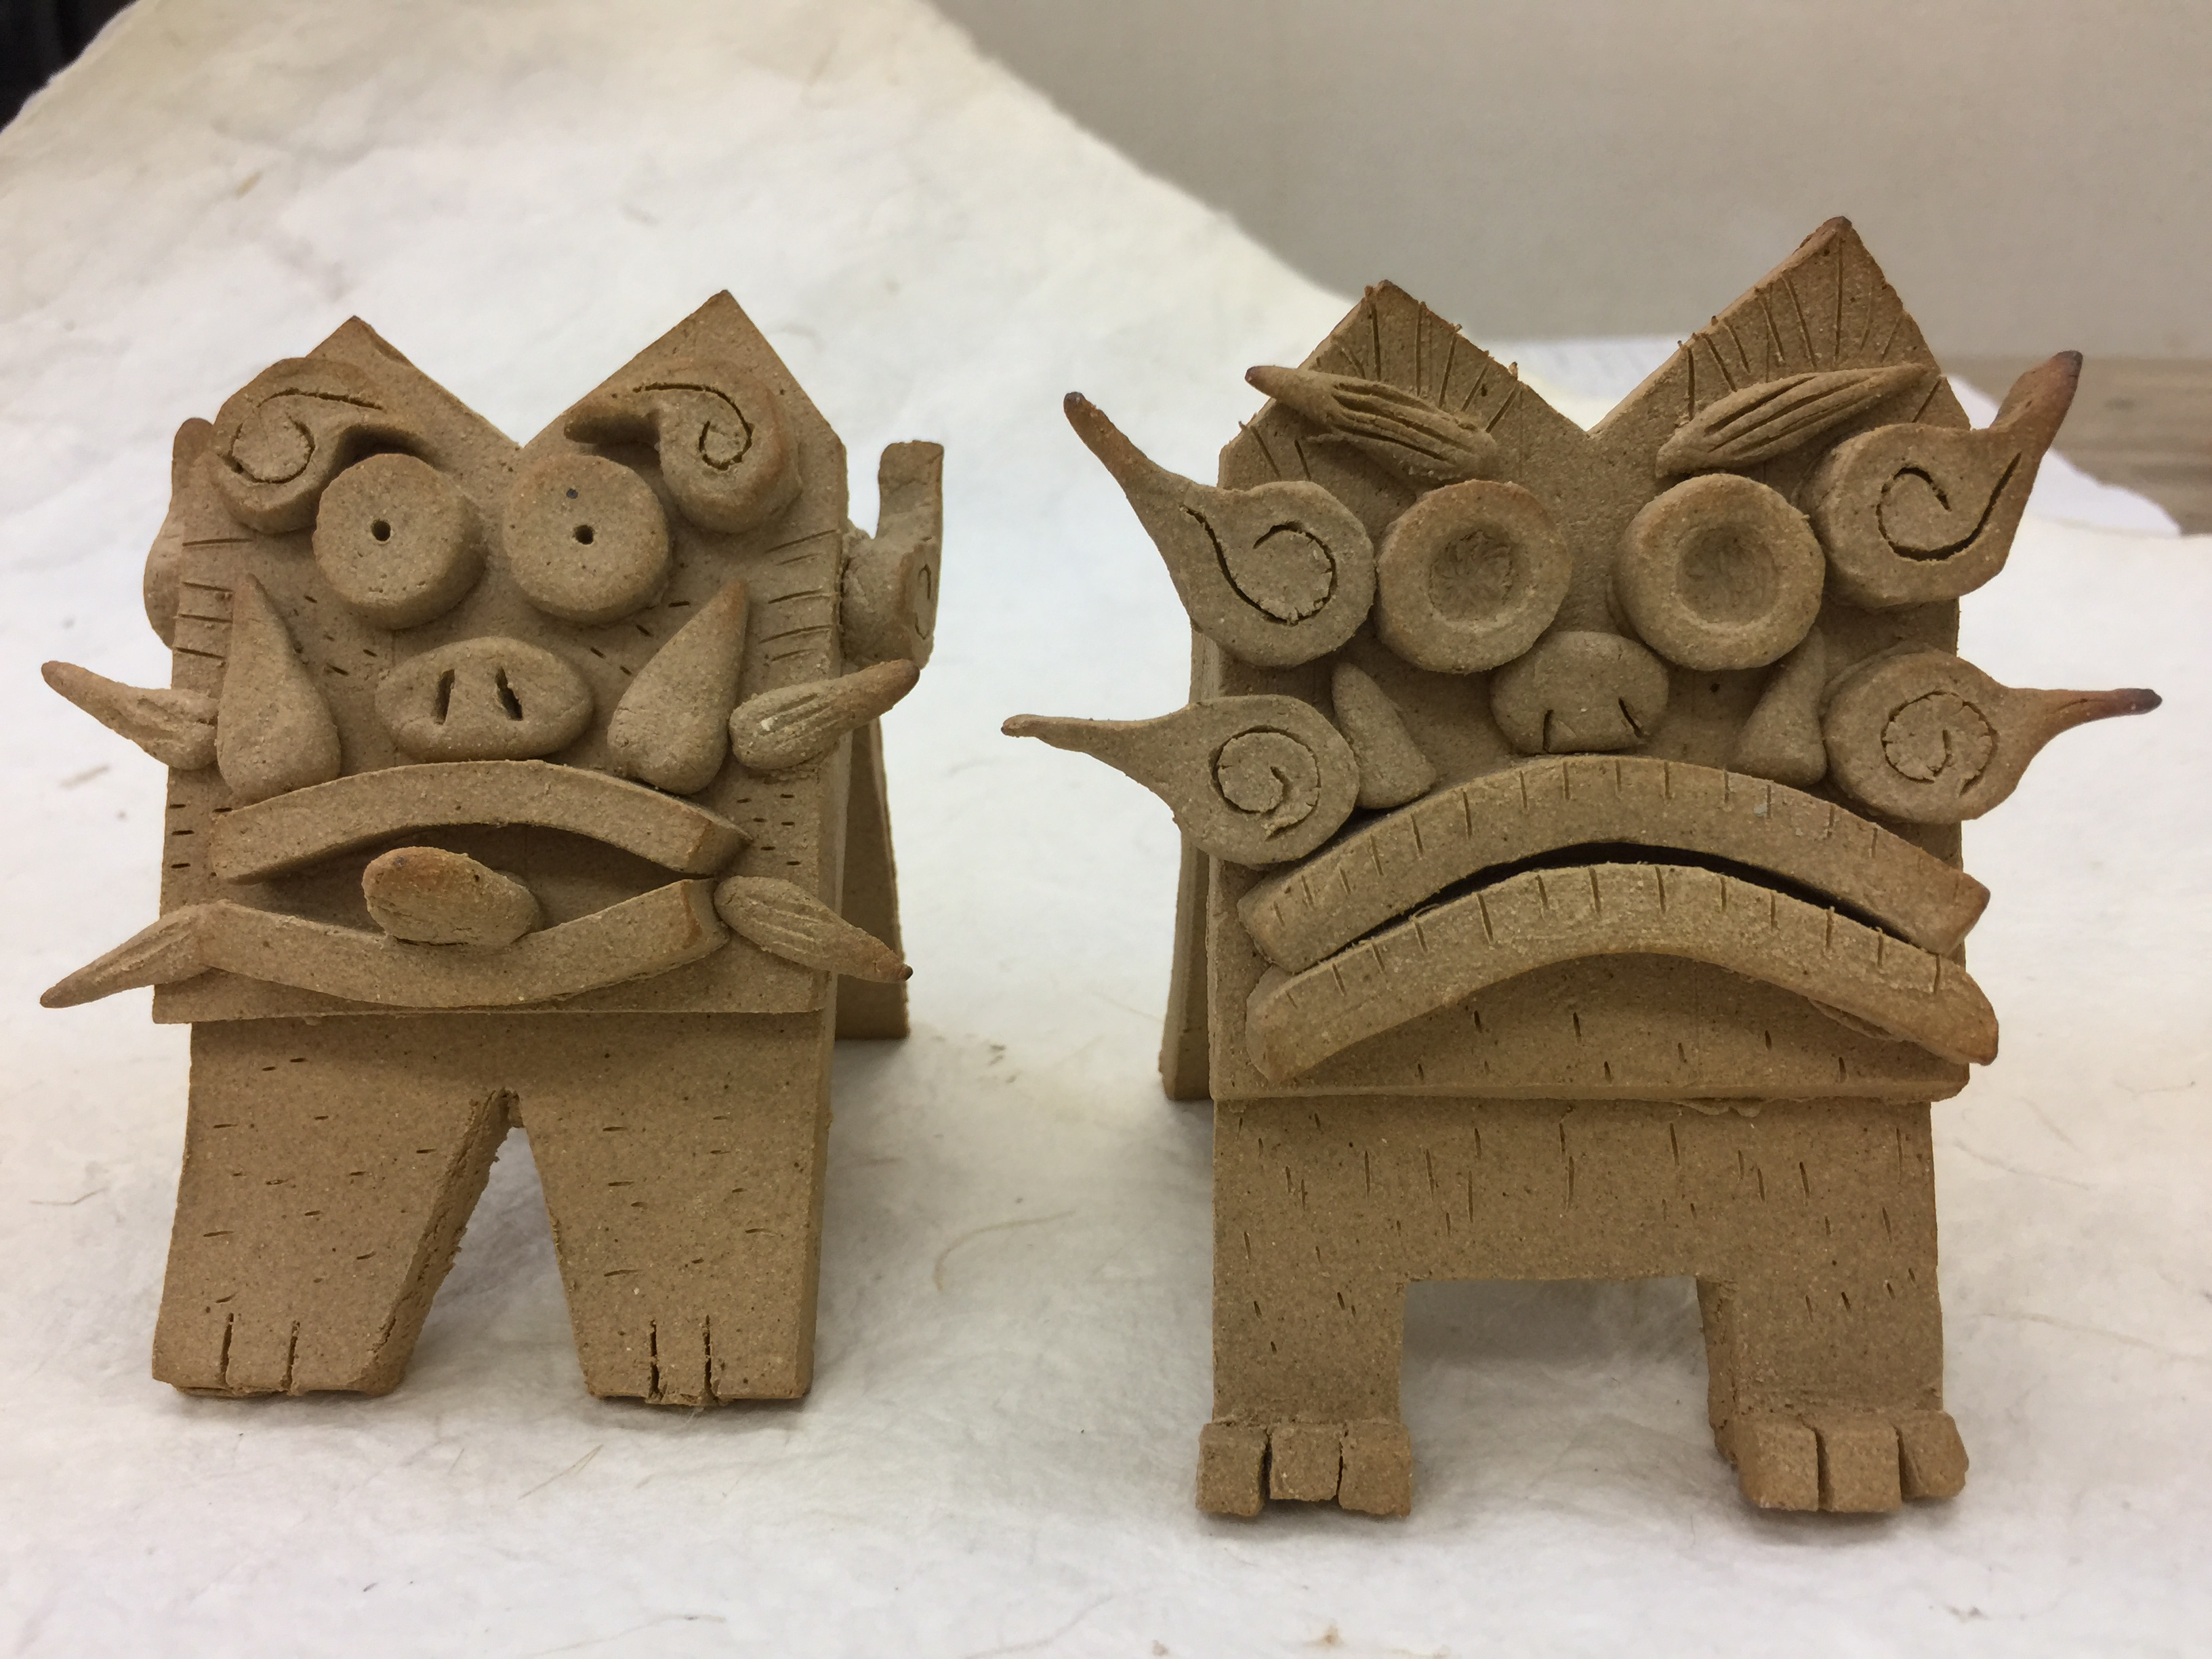 東京の陶芸教室千秋工房 シーサー体験